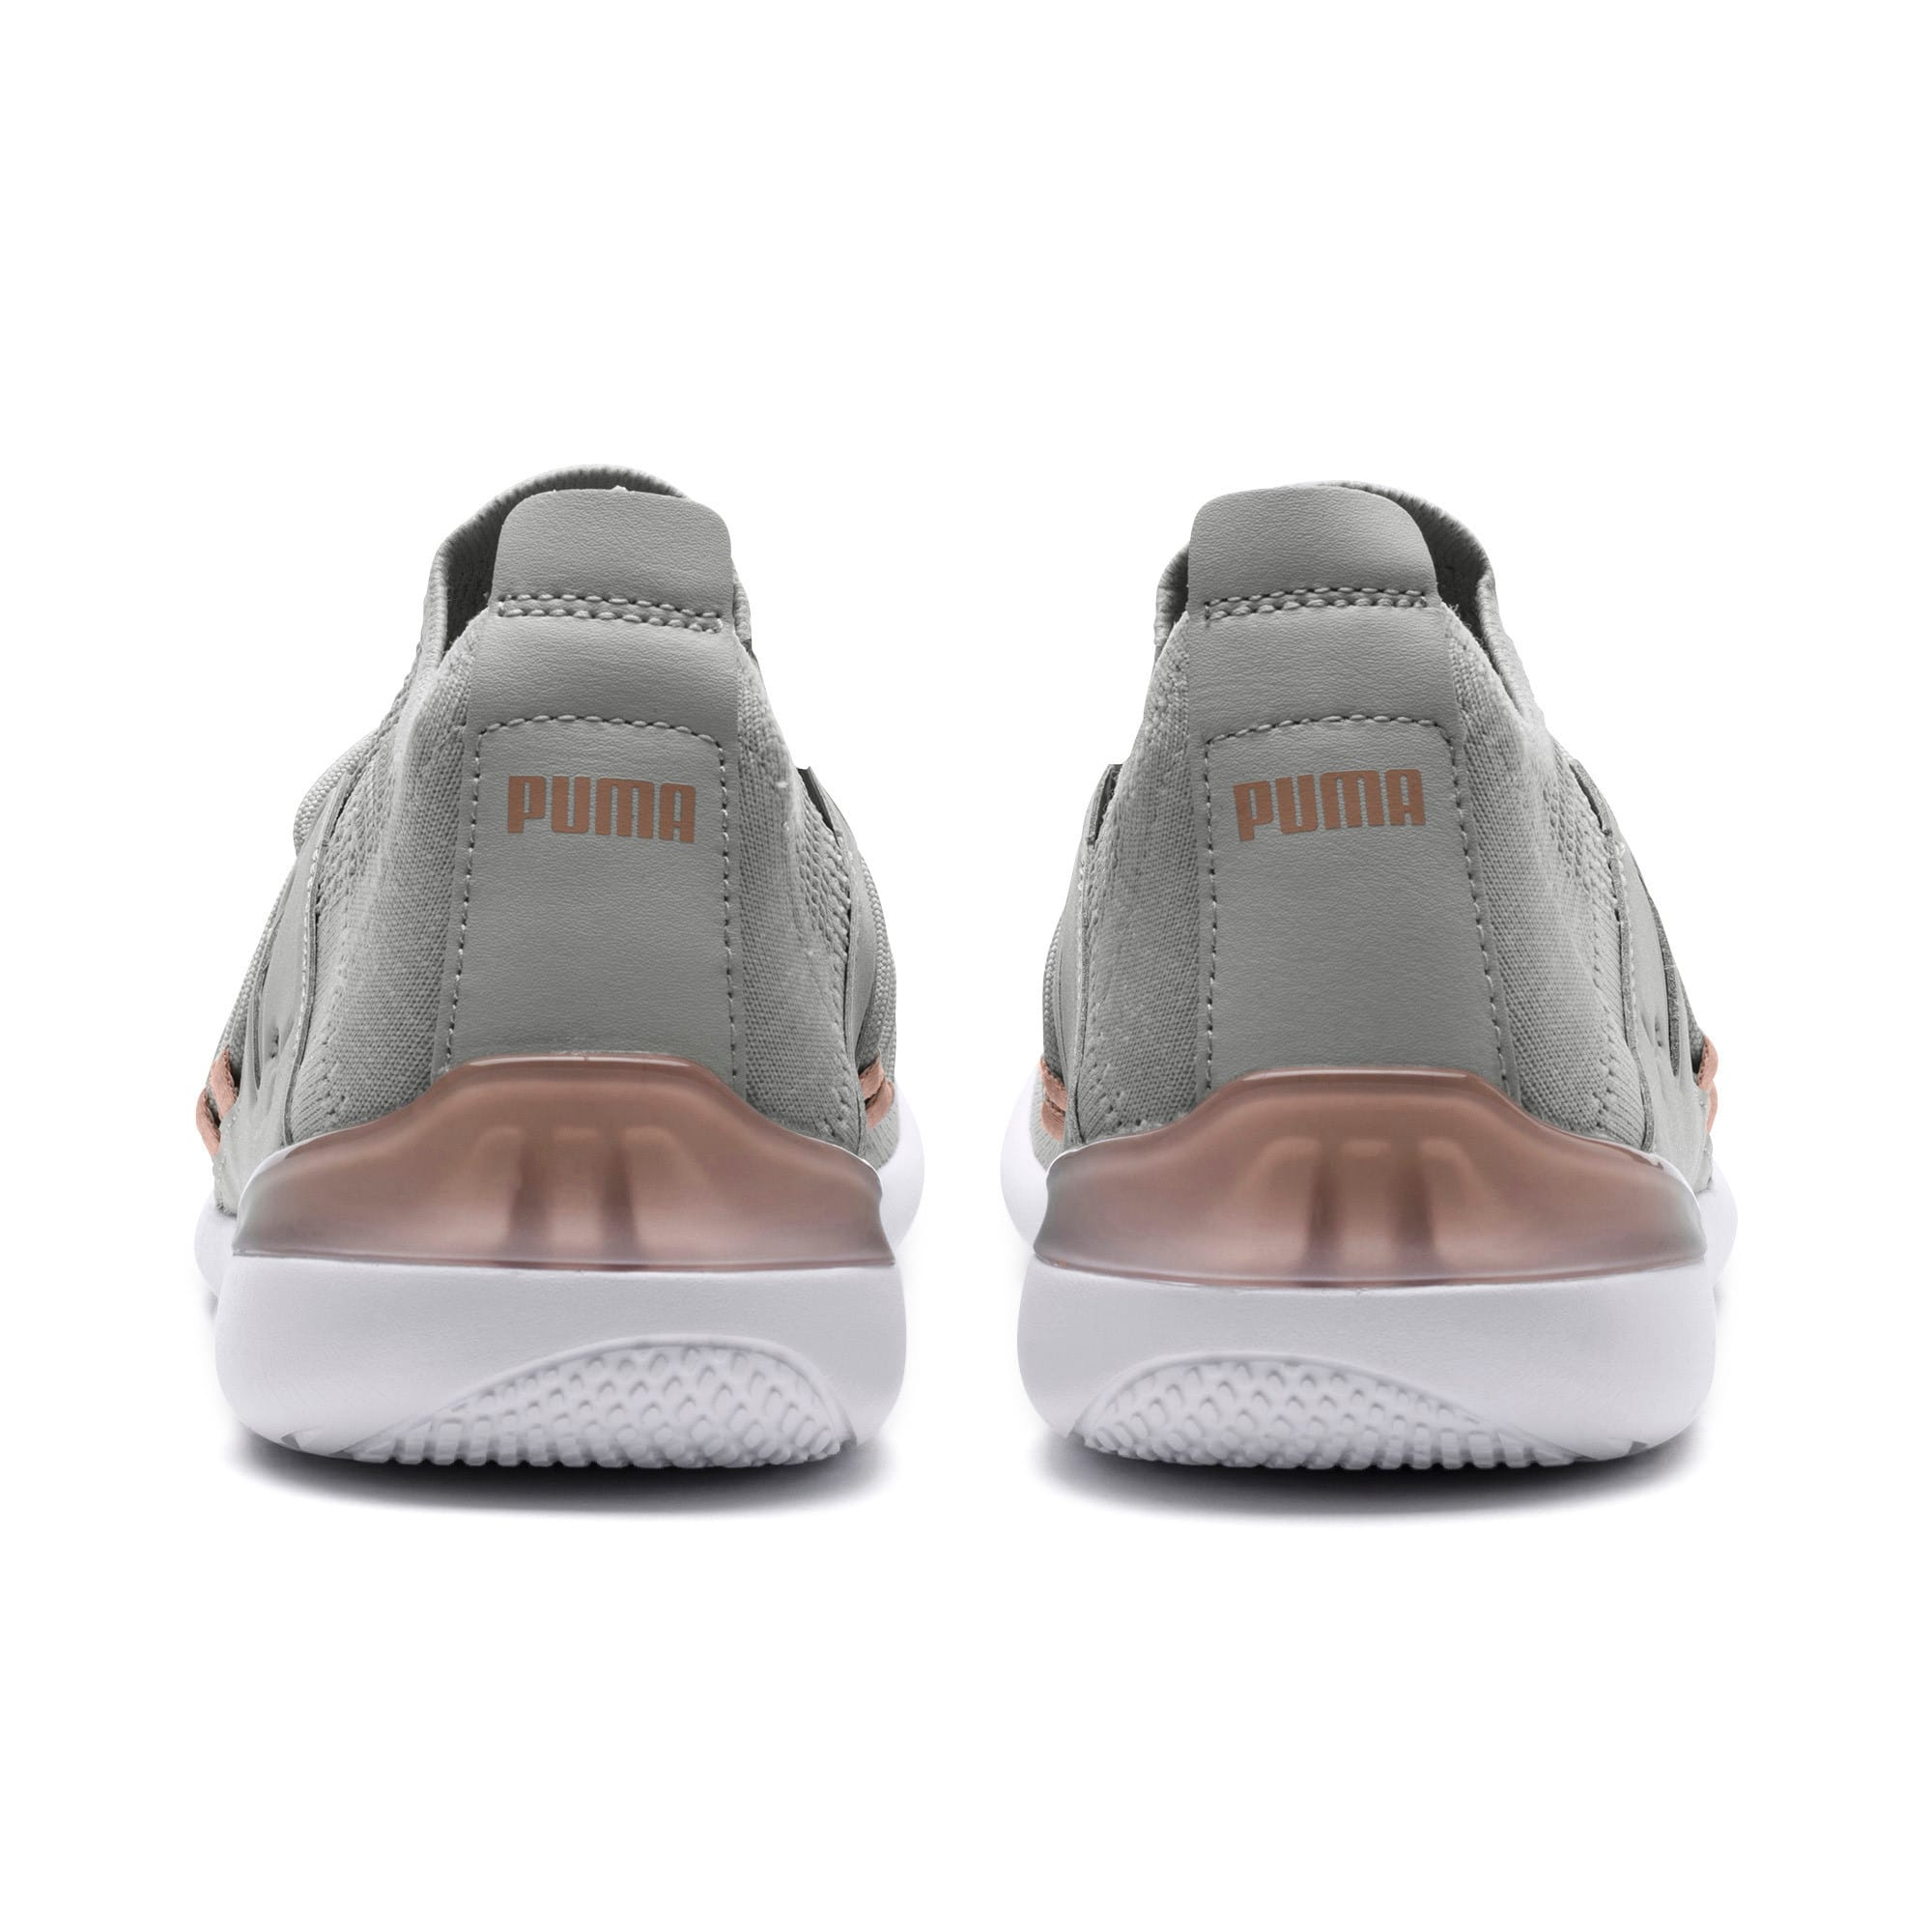 Thumbnail 4 of Evo Cat Sock Lace Monaco Women's Sneakers, GrayViolet-MahoganyRose-Wht, medium